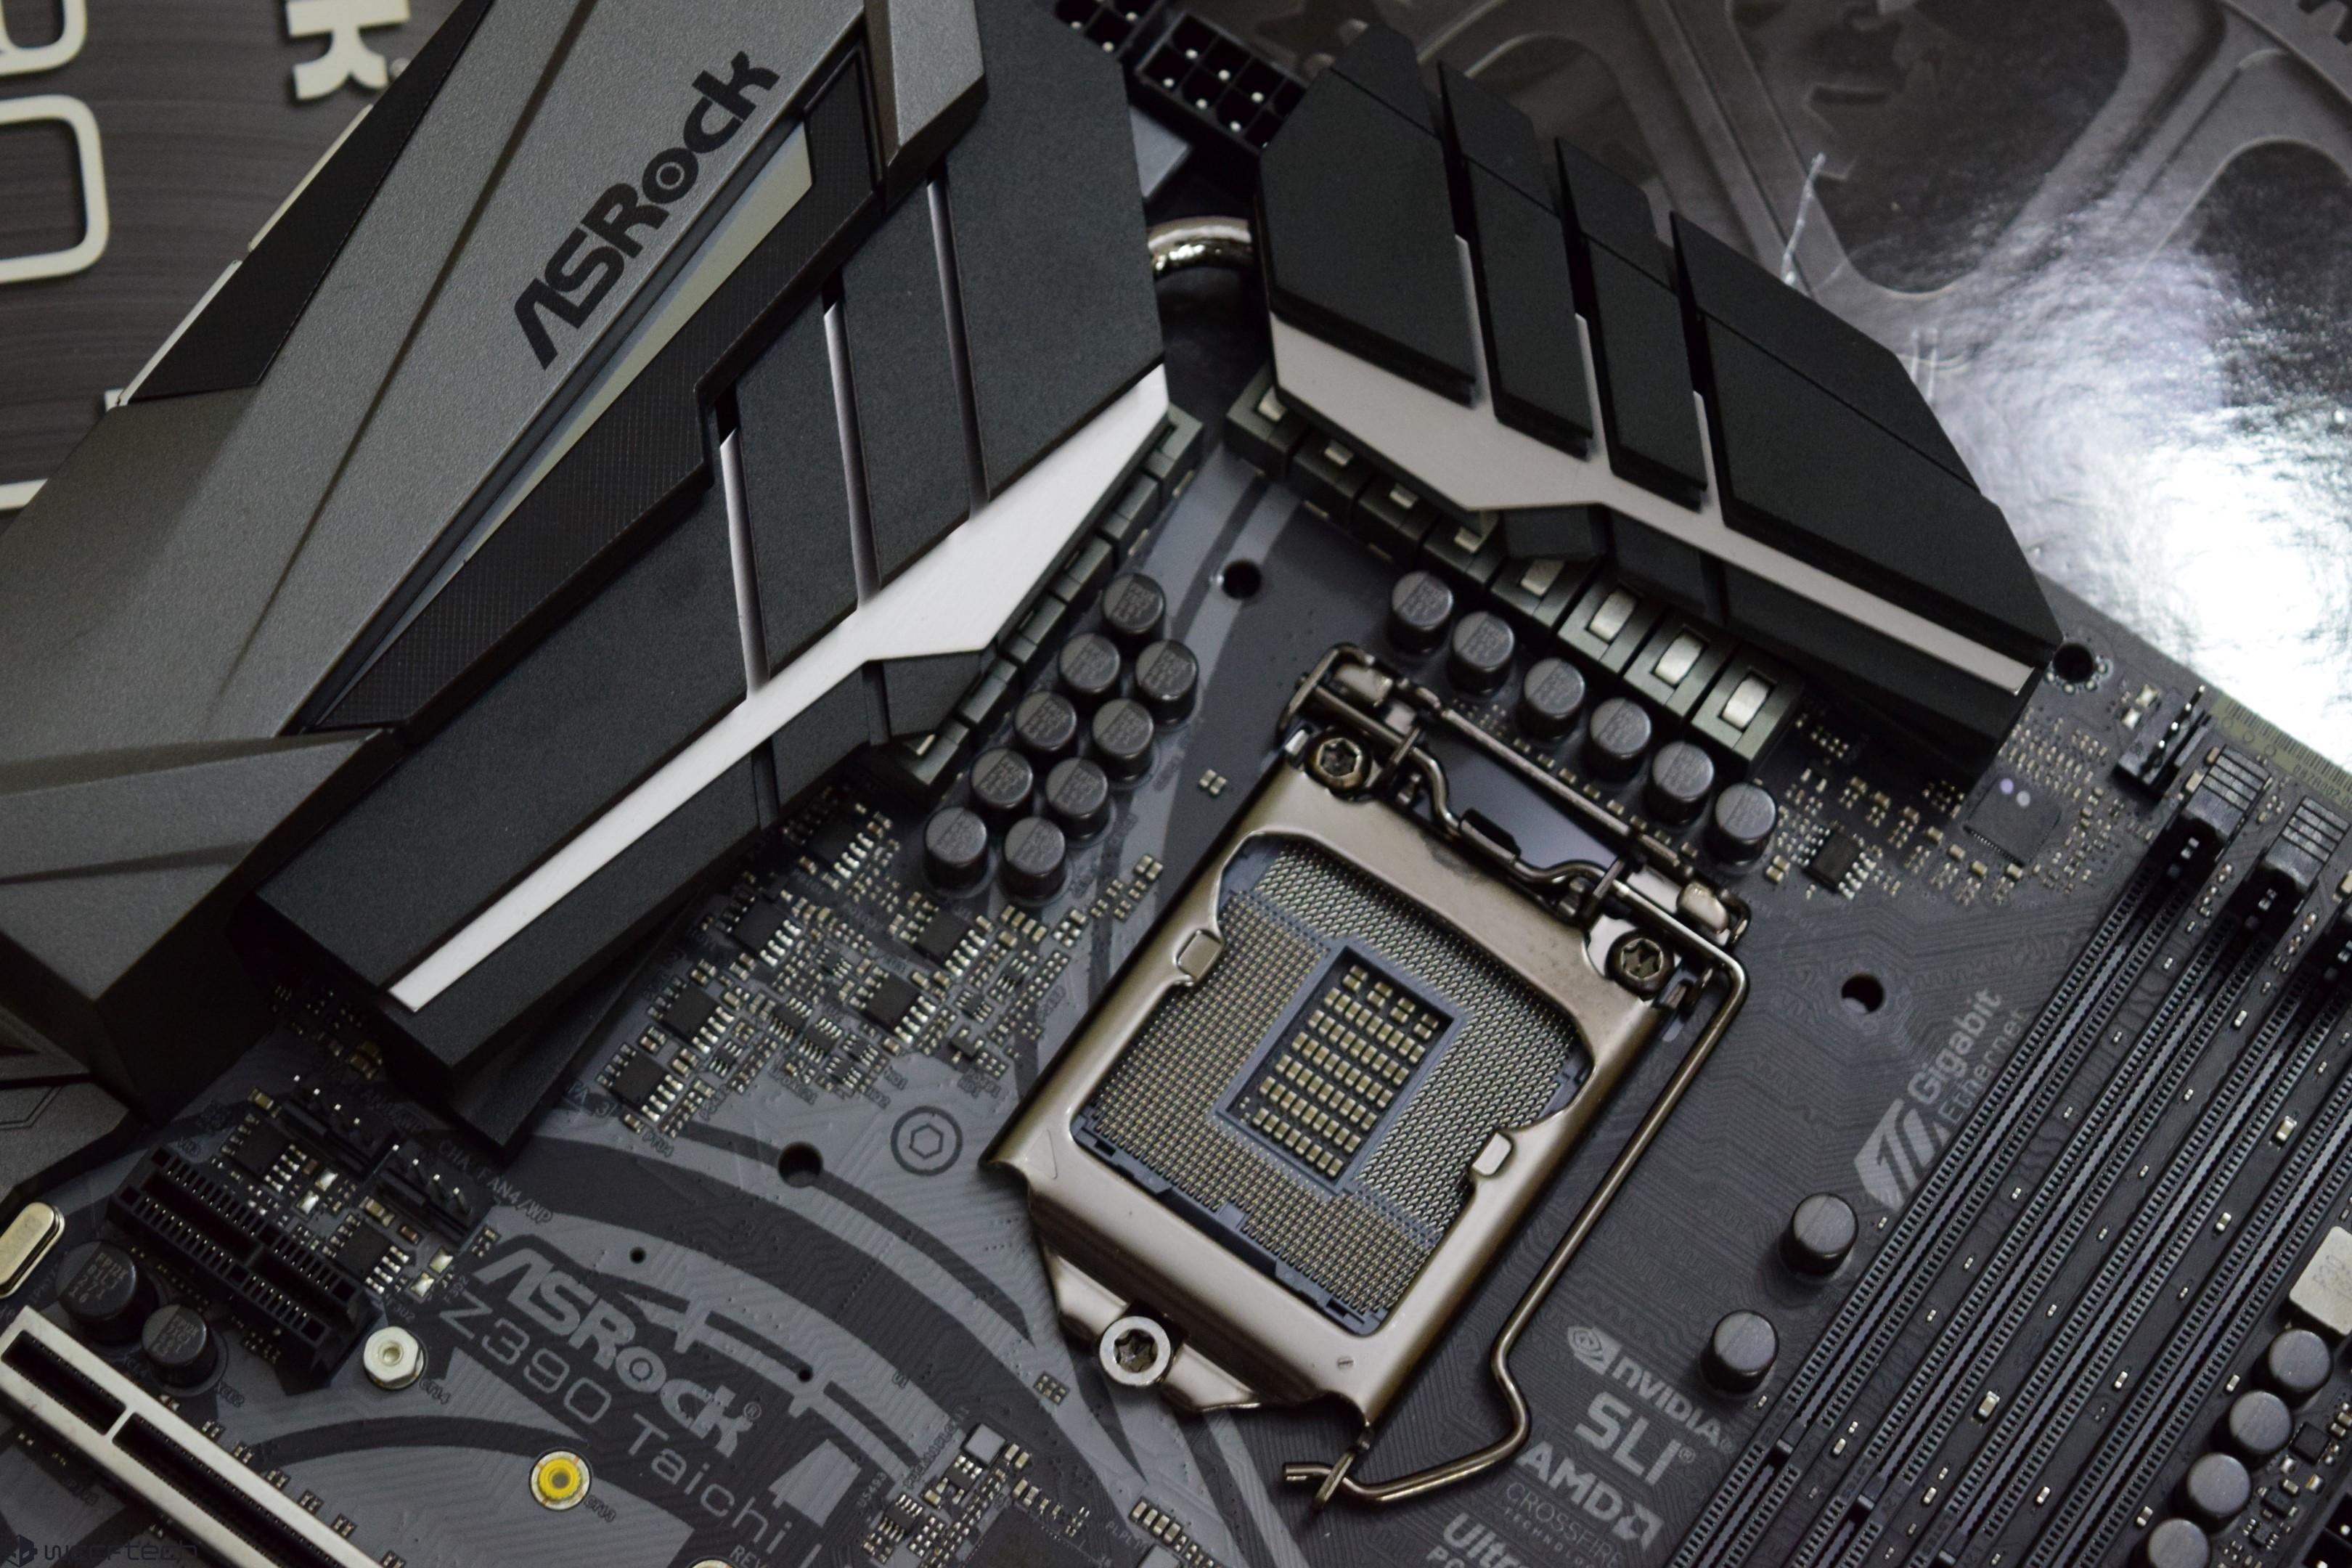 Intel Core i9-9900K CPU Review on ASRock Z390 Taichi Ultimate